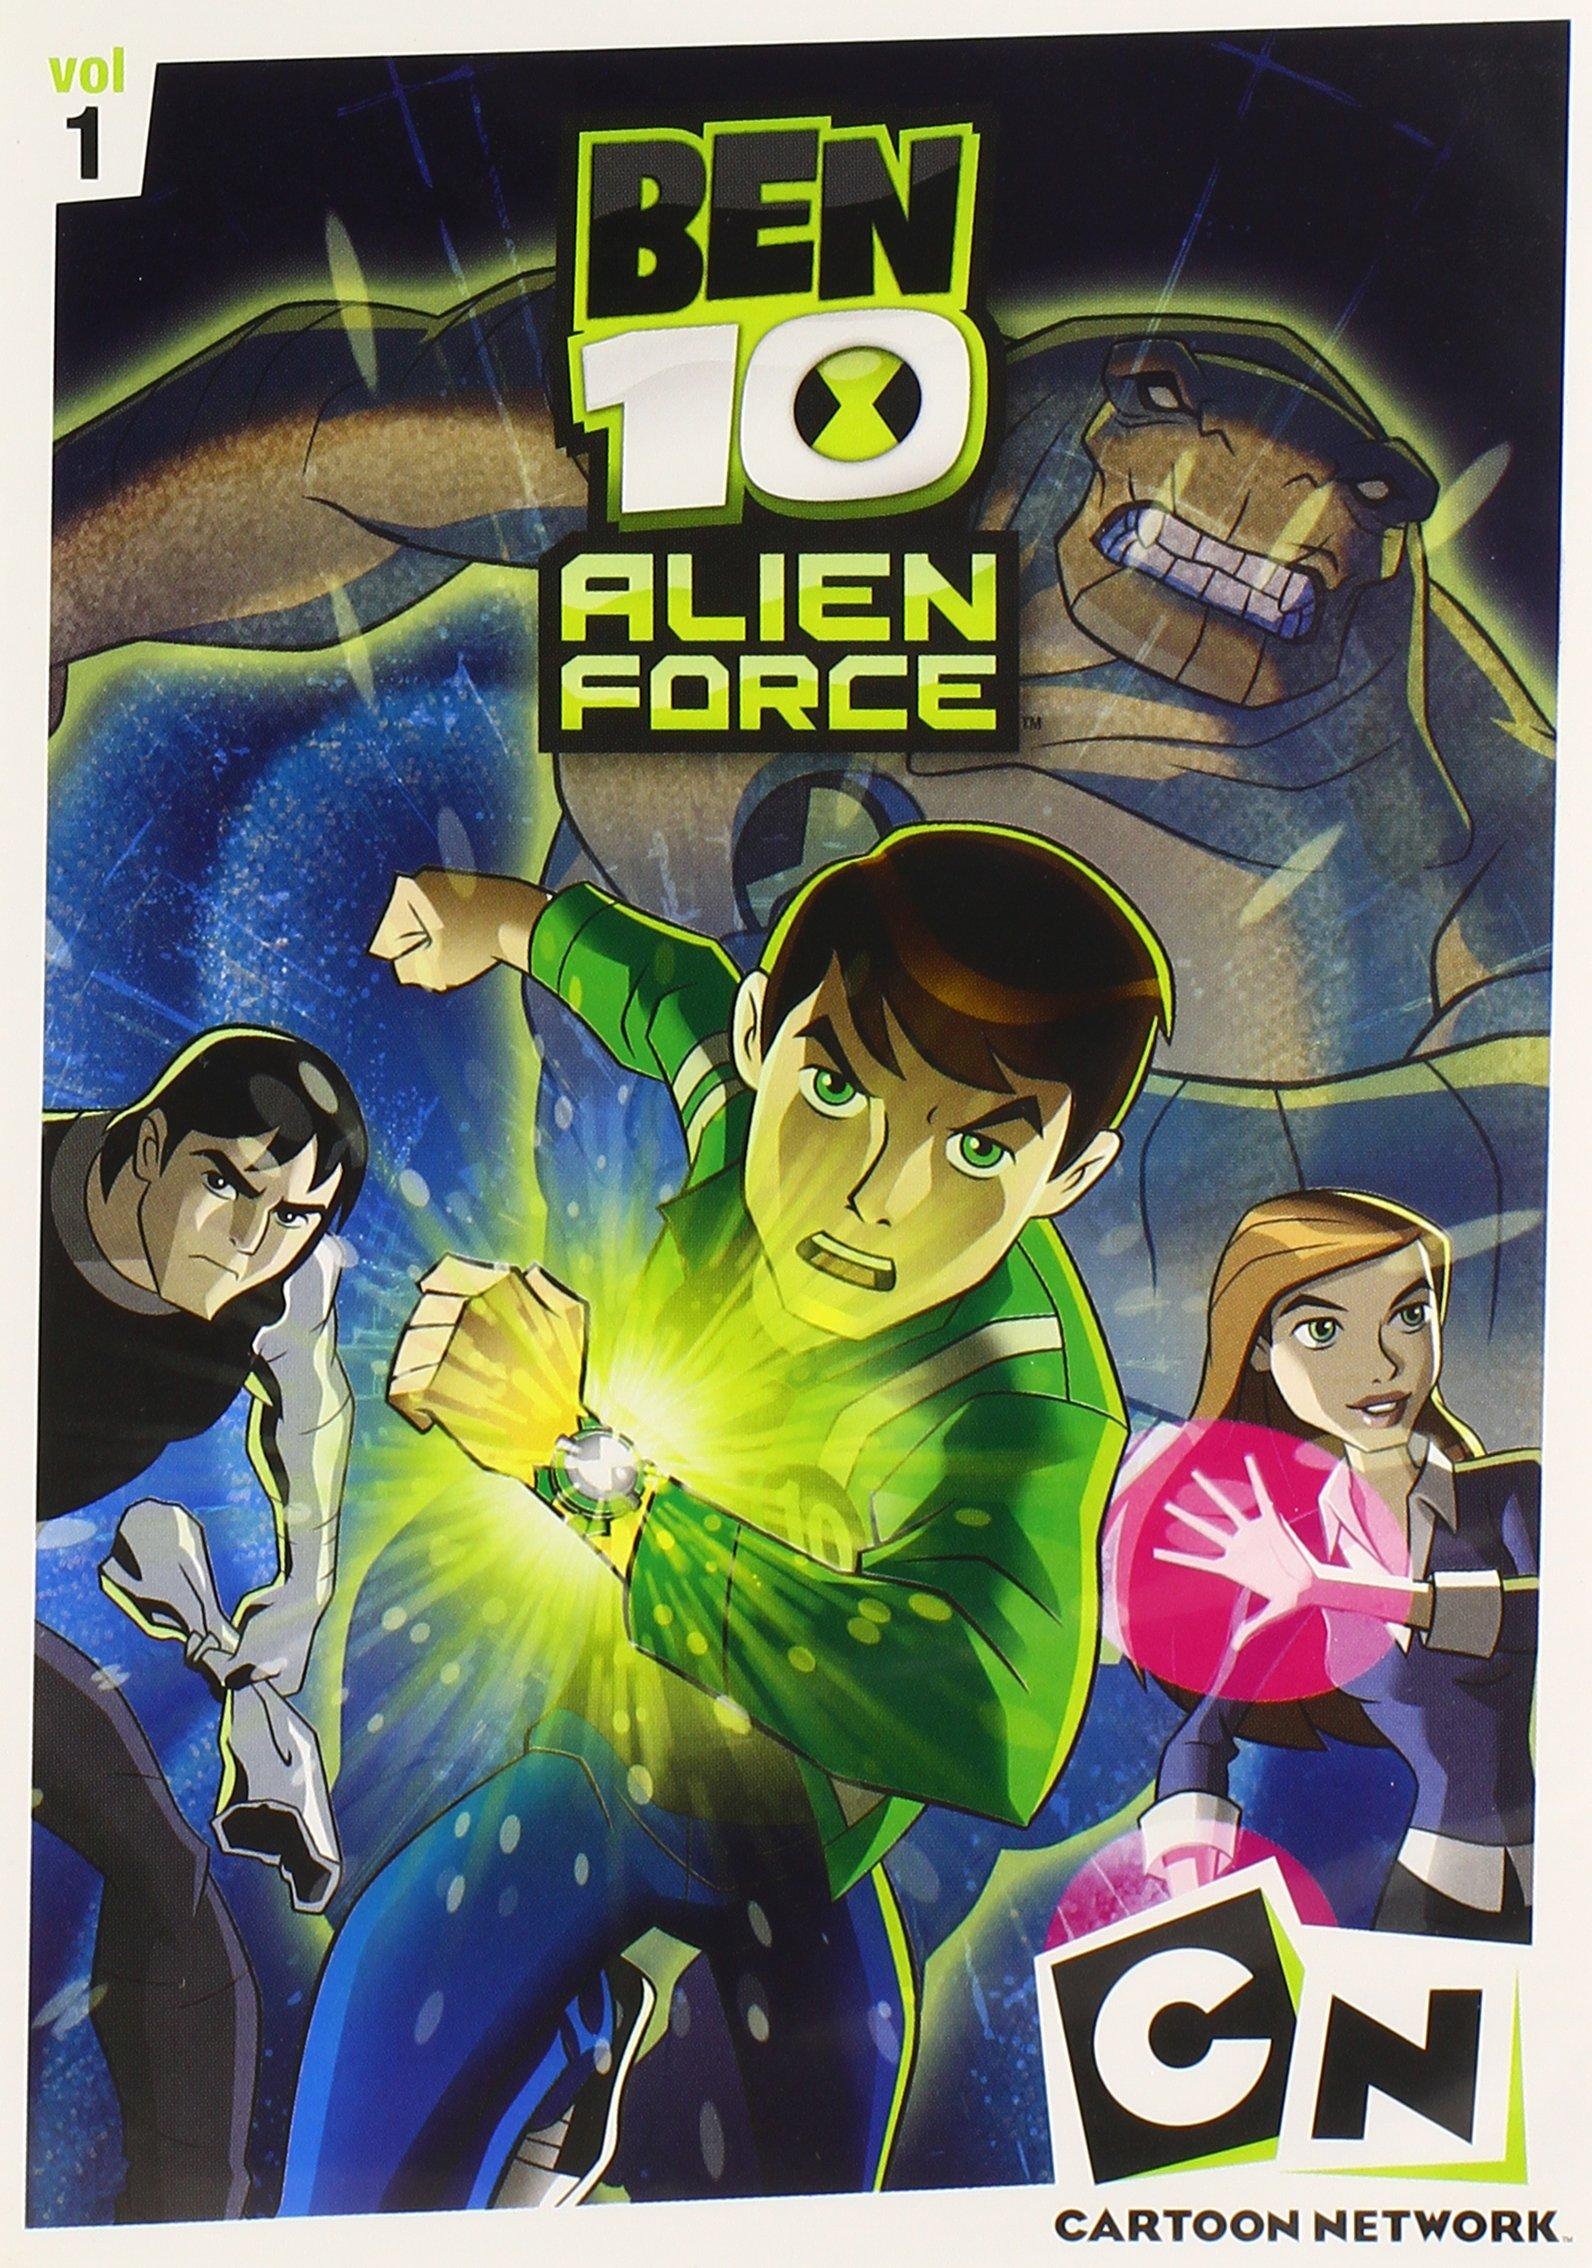 Cartoon Network: Classic Ben 10 Season 1, Volumes 1-3 (DVD)